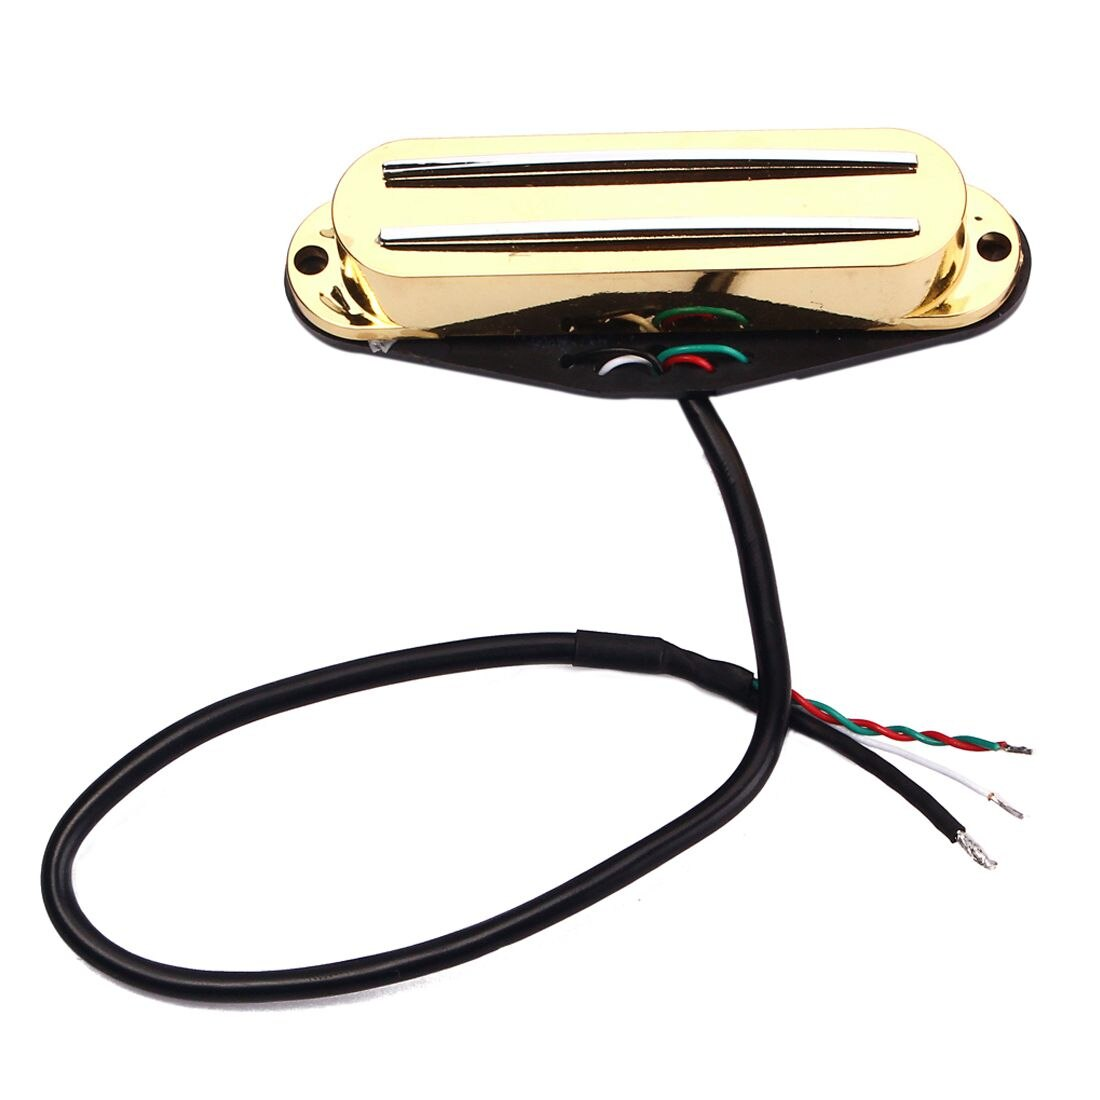 Fastmusic Belcat guitarra Hot railes Pickup para ST partes ferrita Mini Humbucker